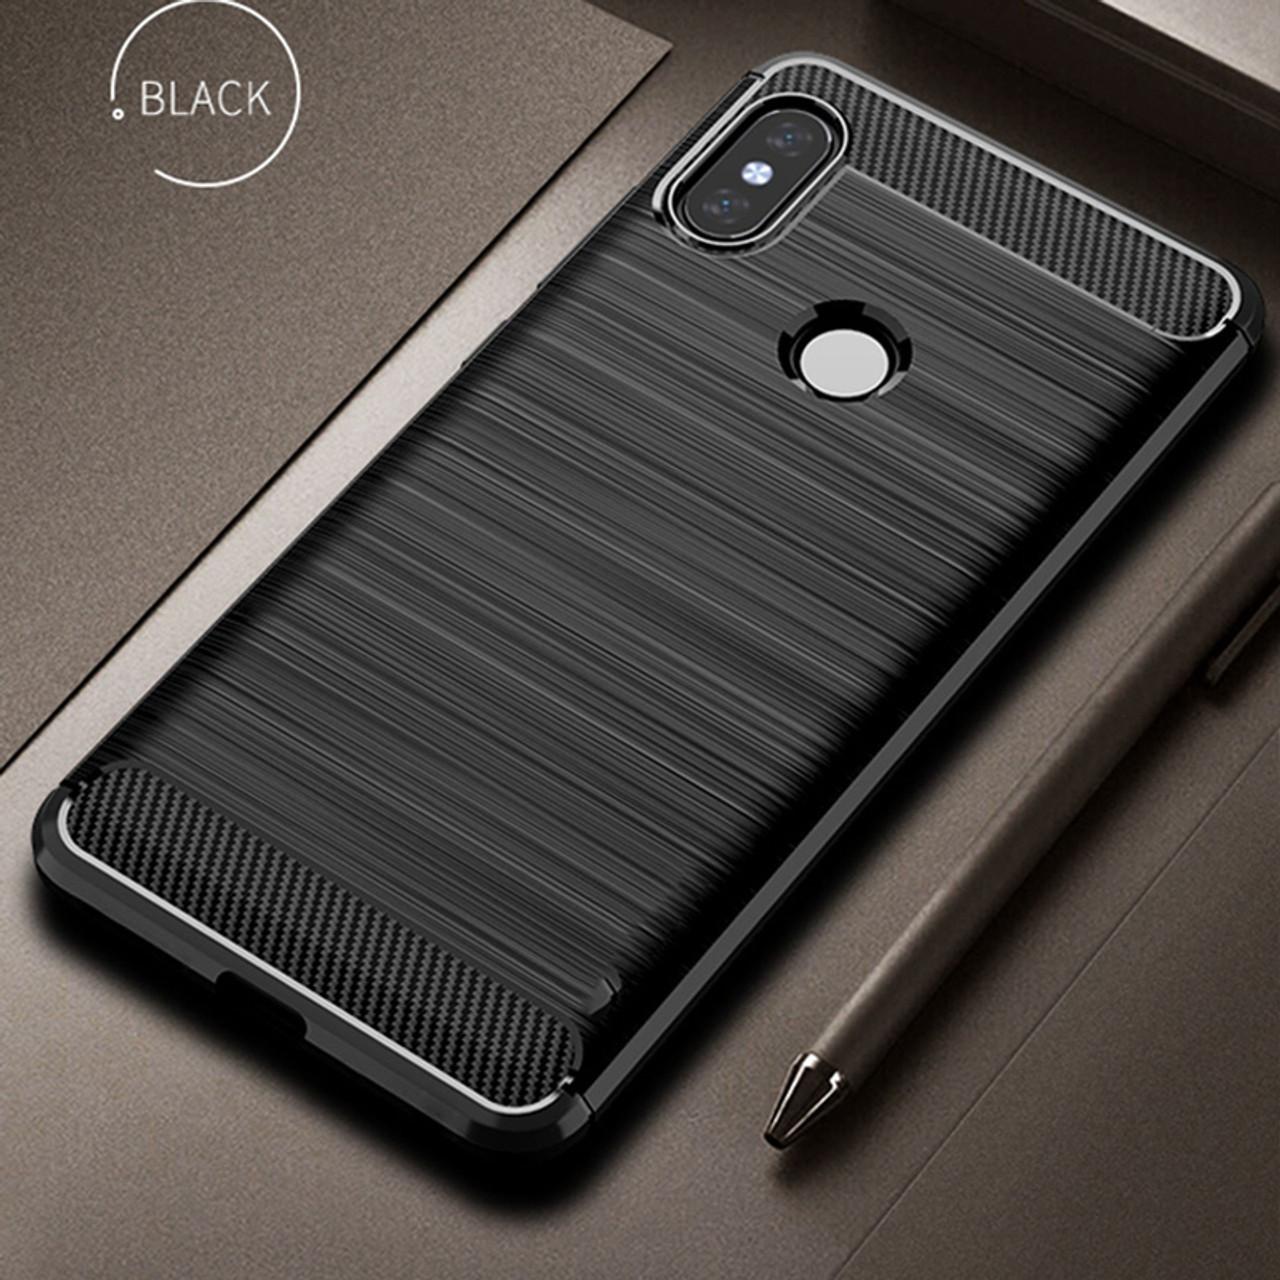 low priced d636d 892bf Silicone Case For Xiaomi Mi A2 Case Cover for Mi A2 Lite Case Soft Carbon  Fiber Phone Case On Xiaomi Mi A 2 lite Redmi 6 Pro